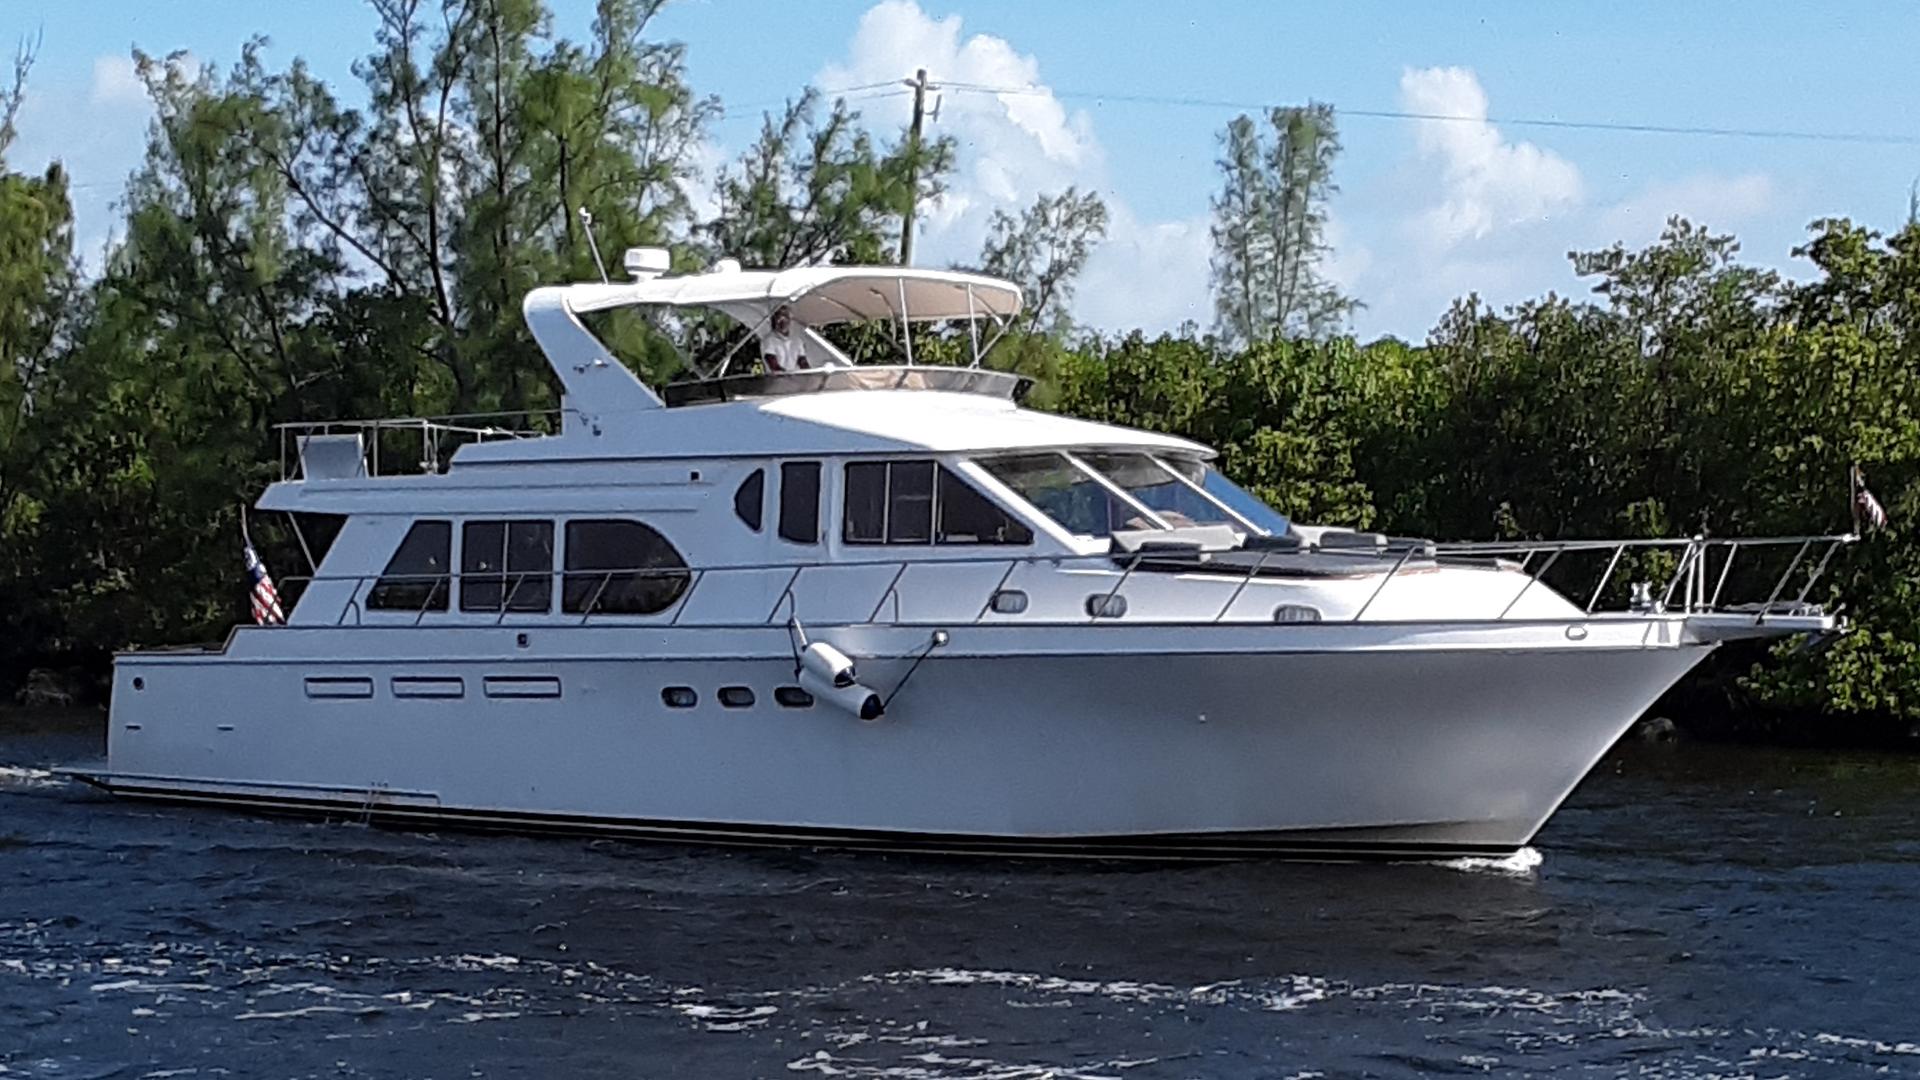 61' Ocean Alexander 2000 610 Pilothouse Name Reserved